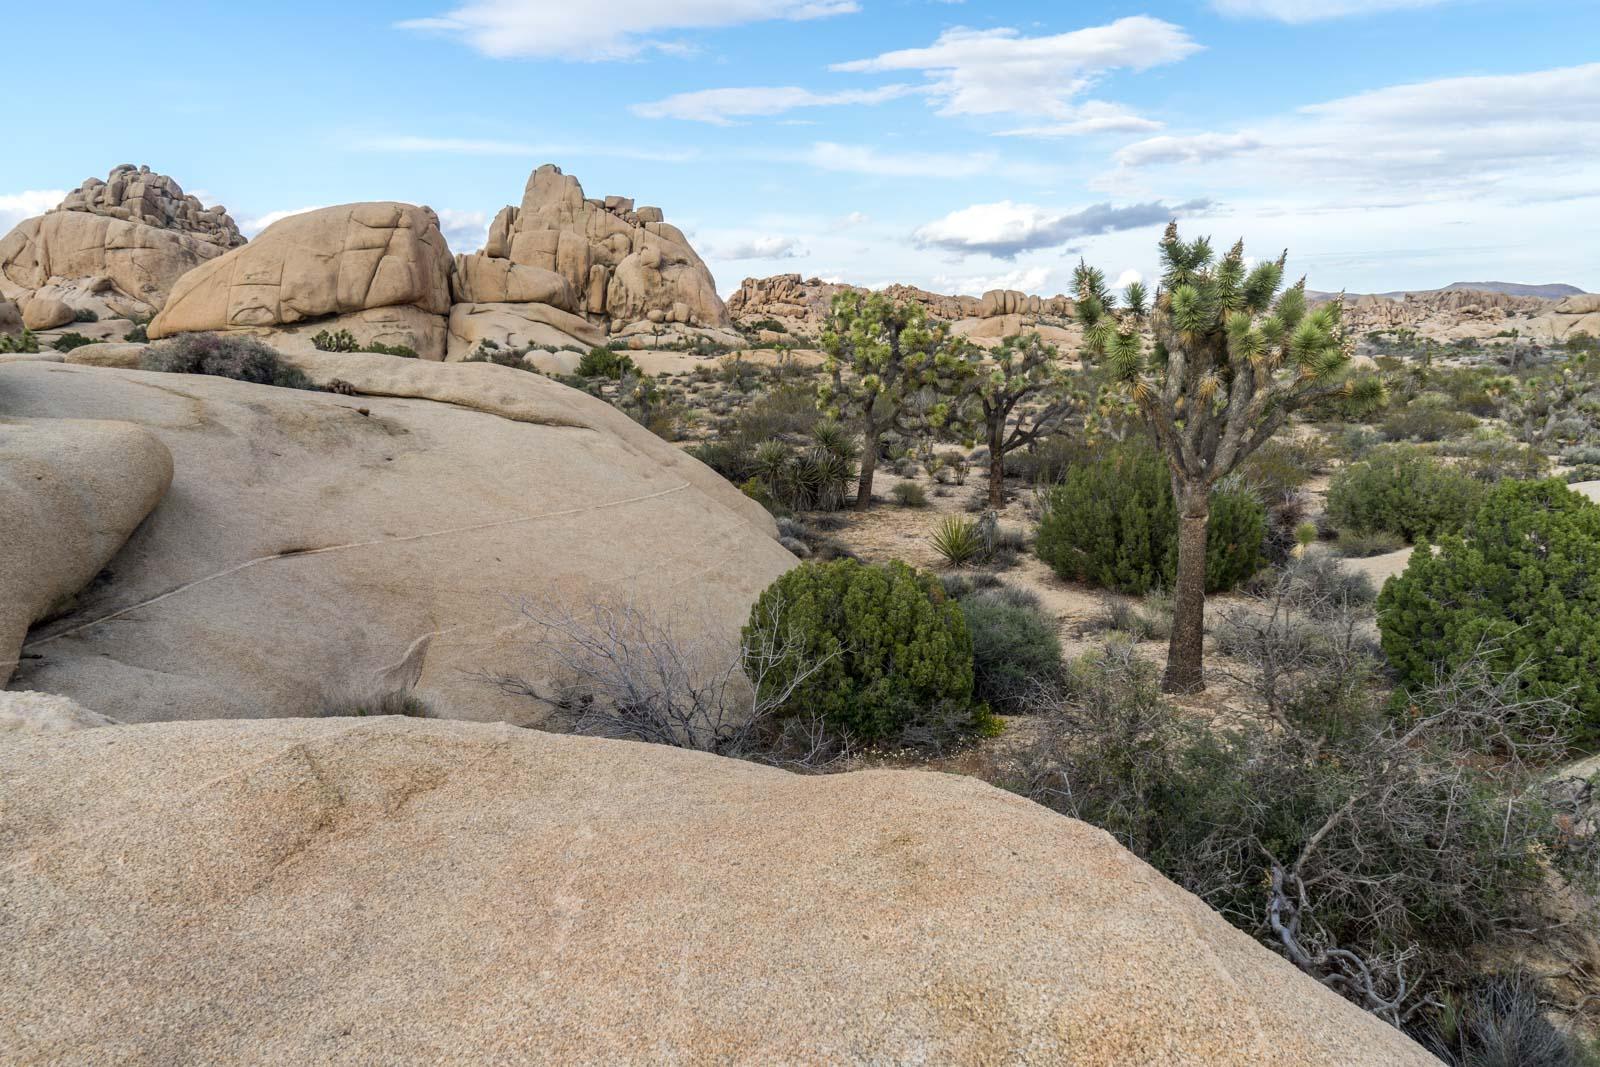 Jumbo Rocks, Joshua Tree National Park, California, USA